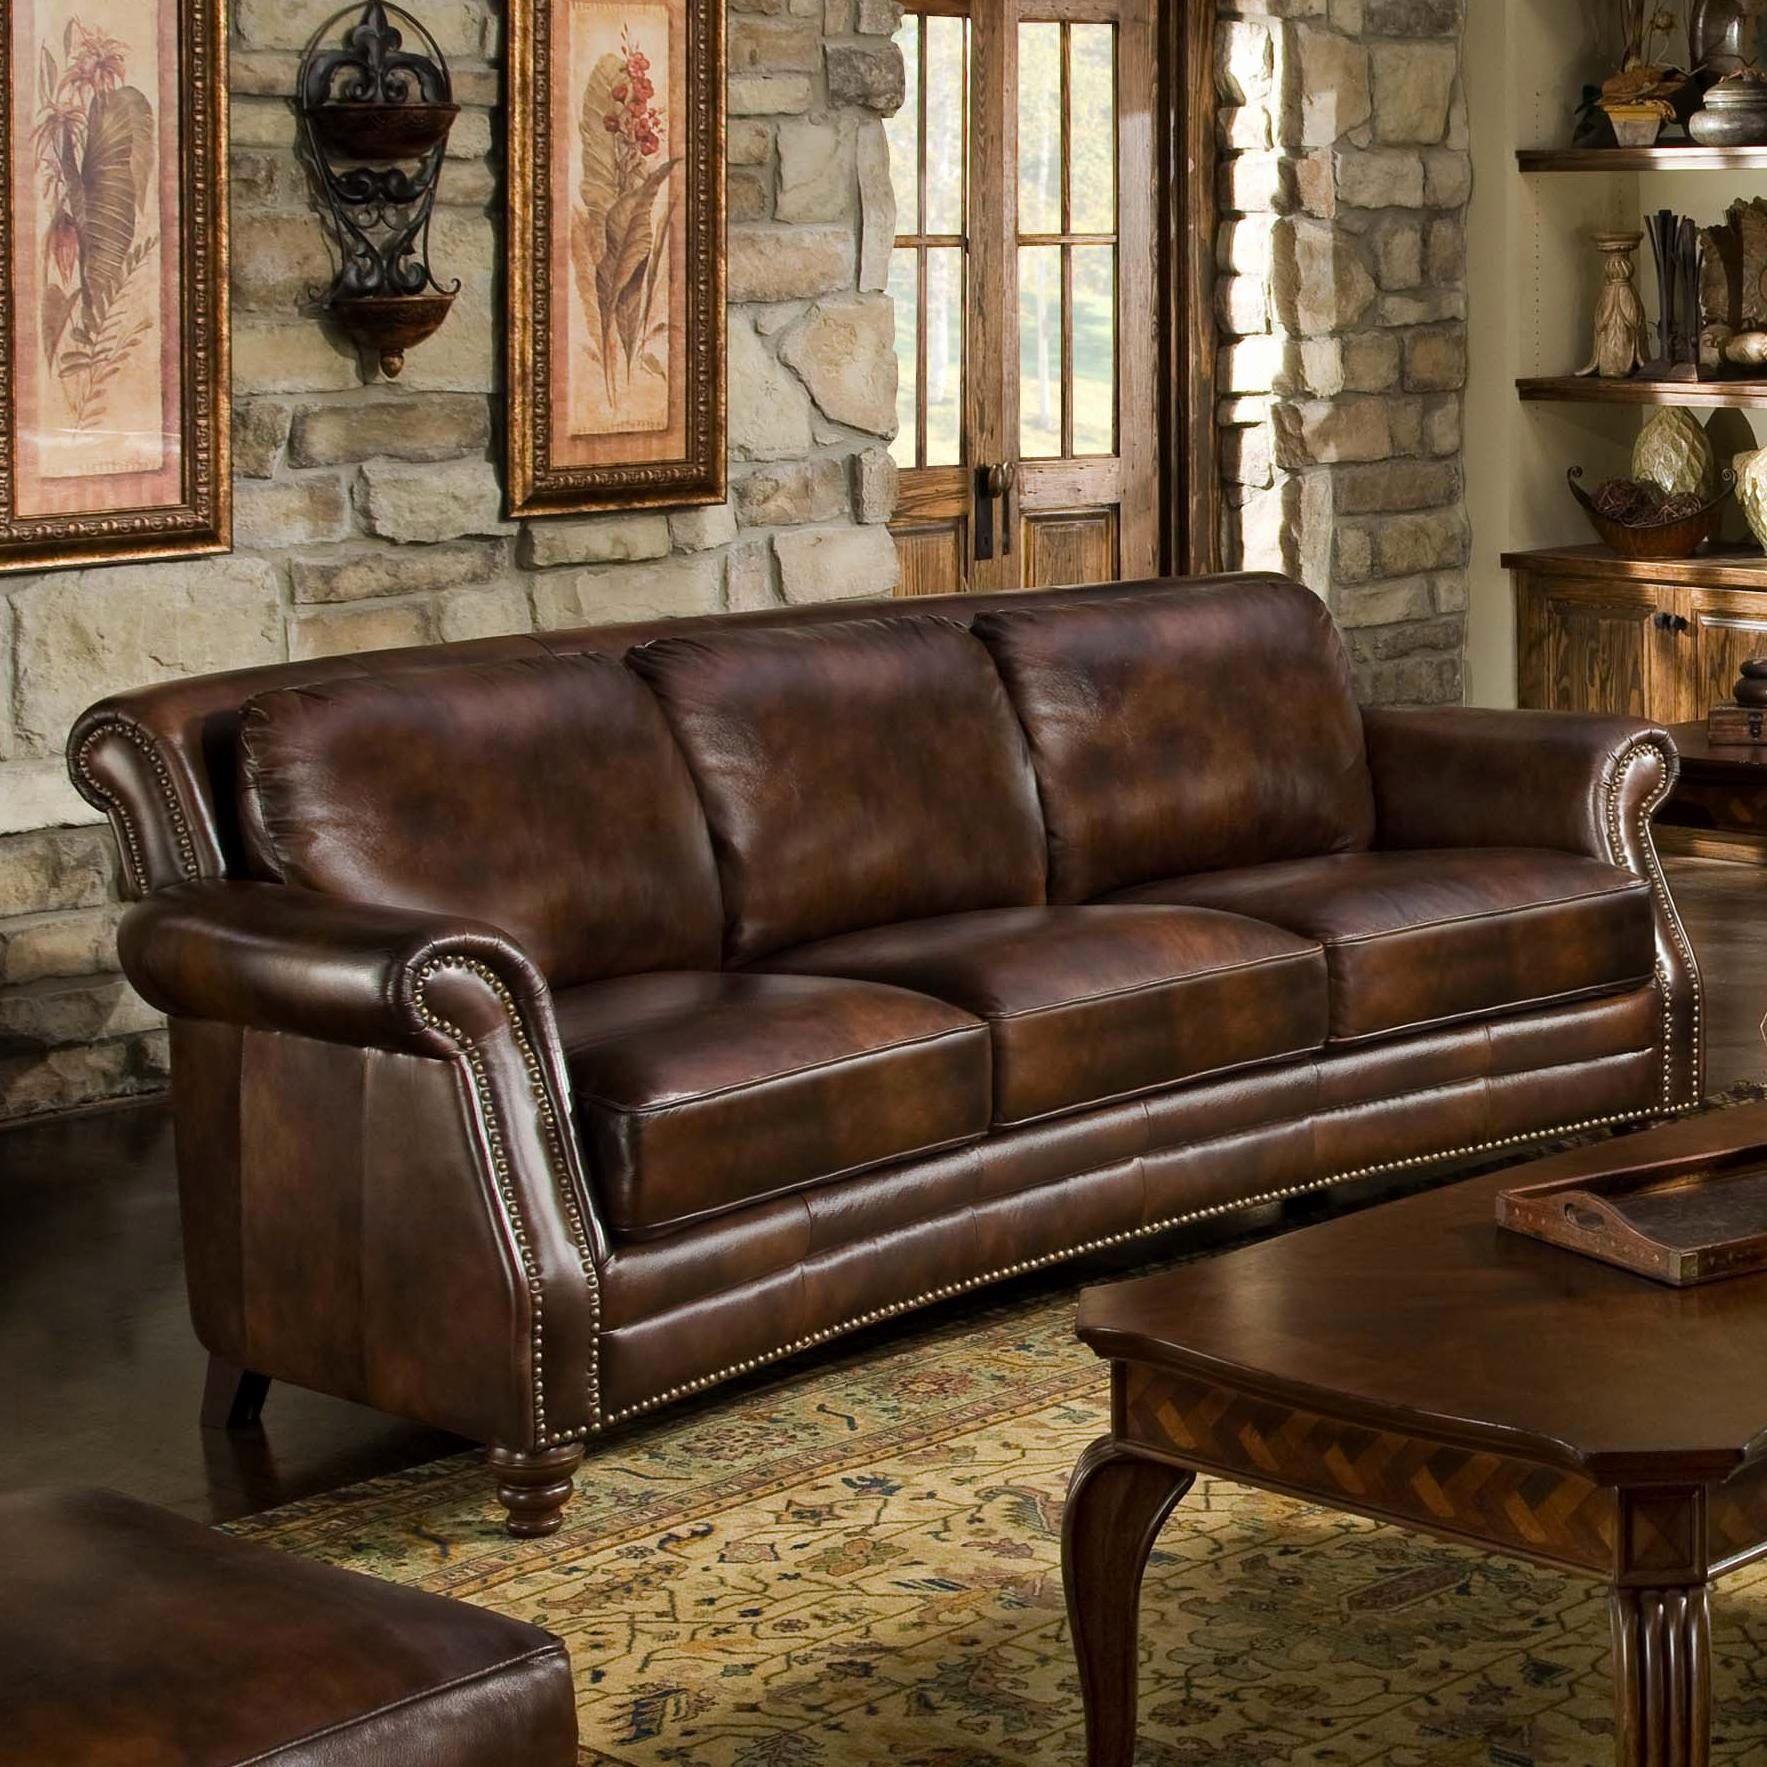 Luxury Leather Nailhead Sofa Photographs Leather Nailhead Sofa